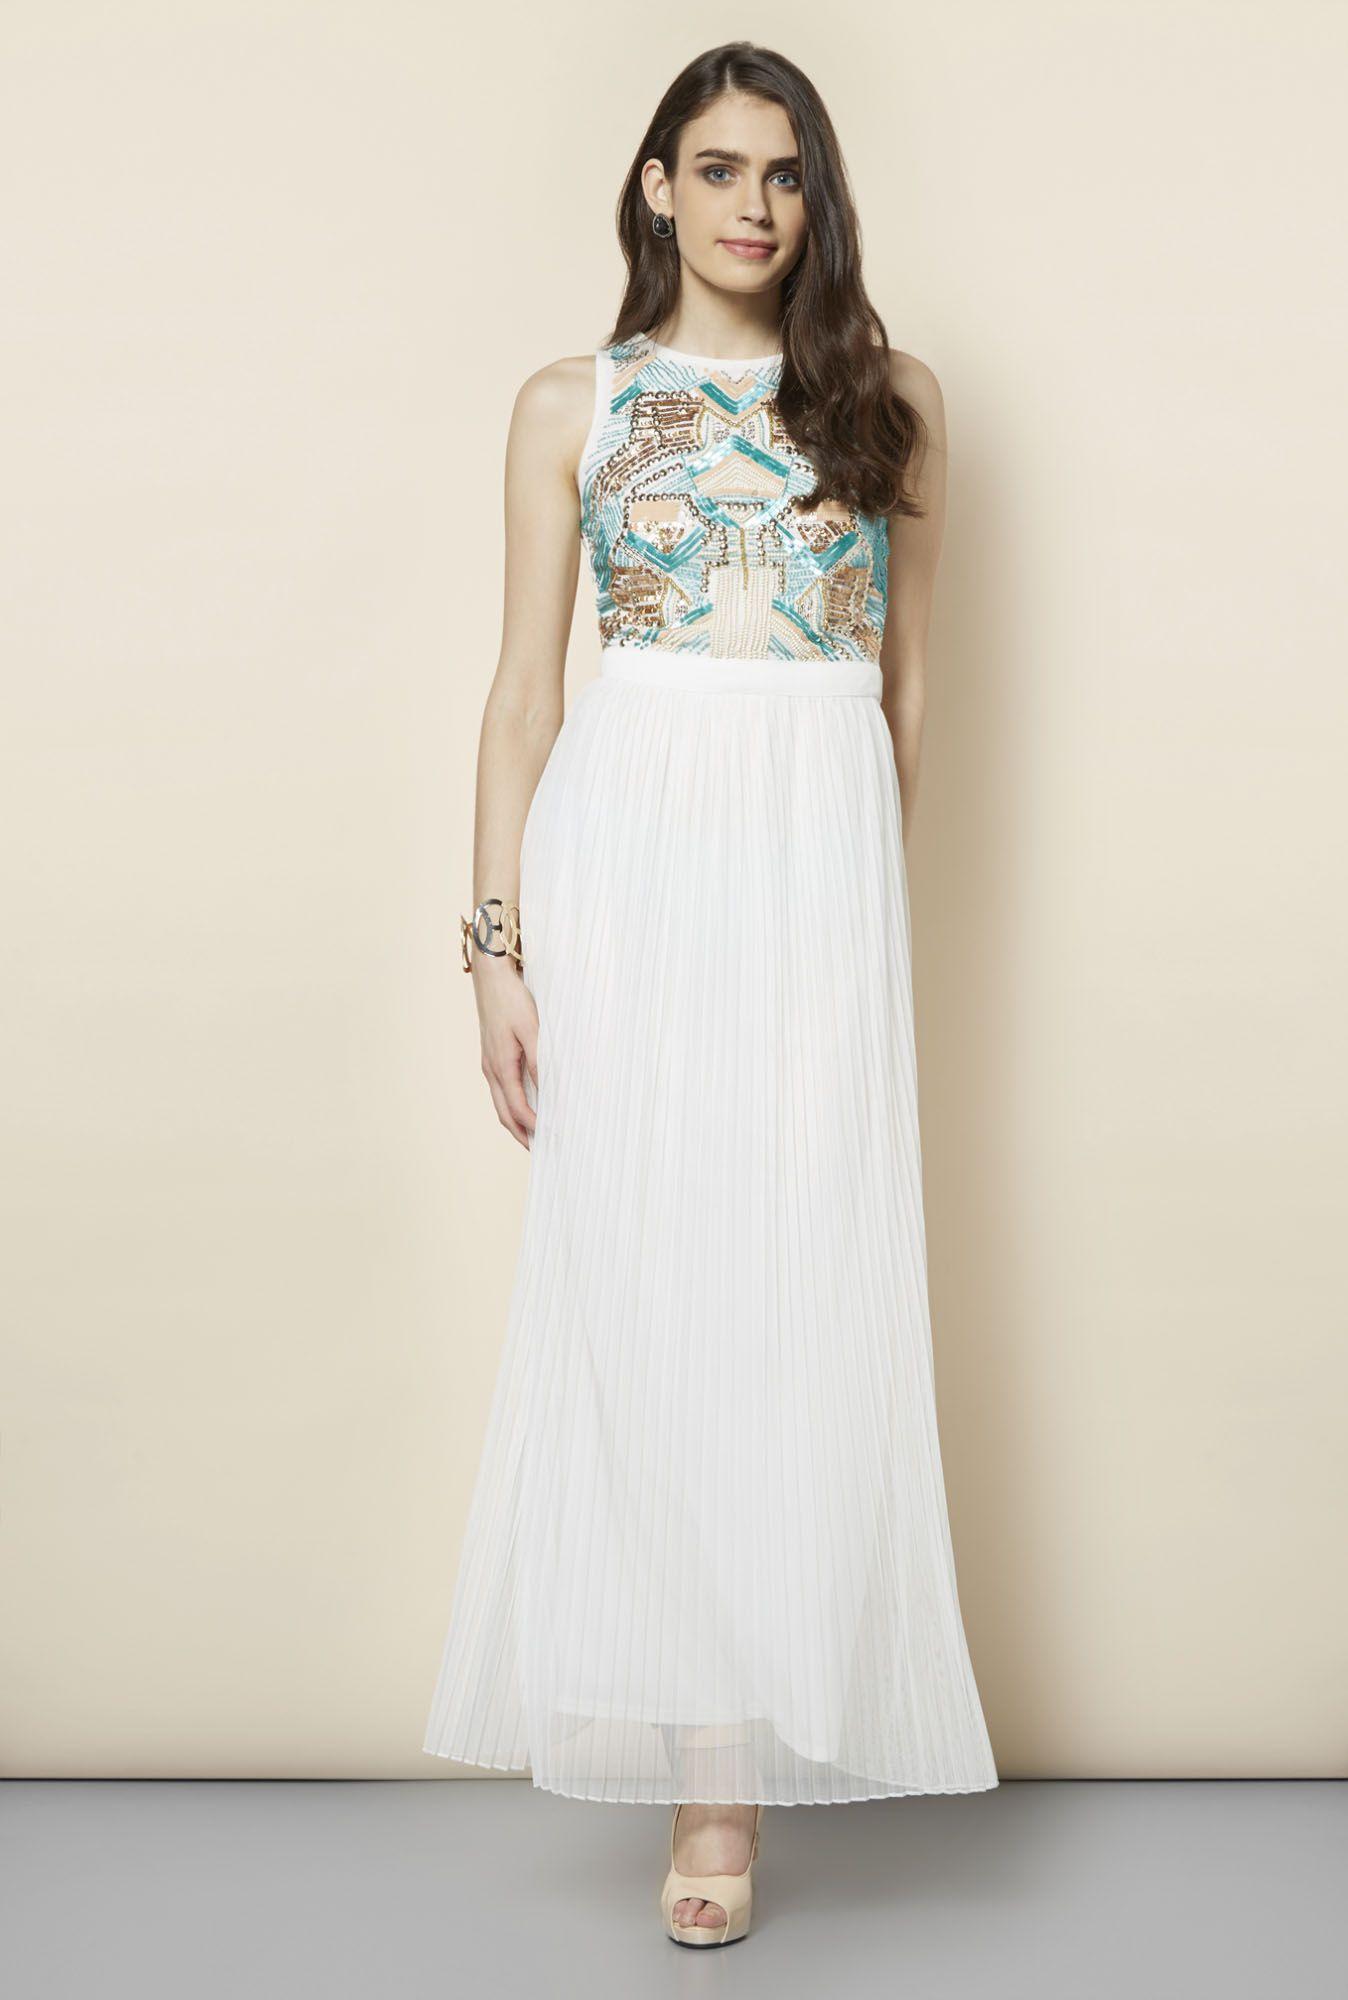 821ba1082d3 FG-4 White Embellished Maxi Dress. FG-4 White Embellished Maxi Dress  Western Dresses For Women